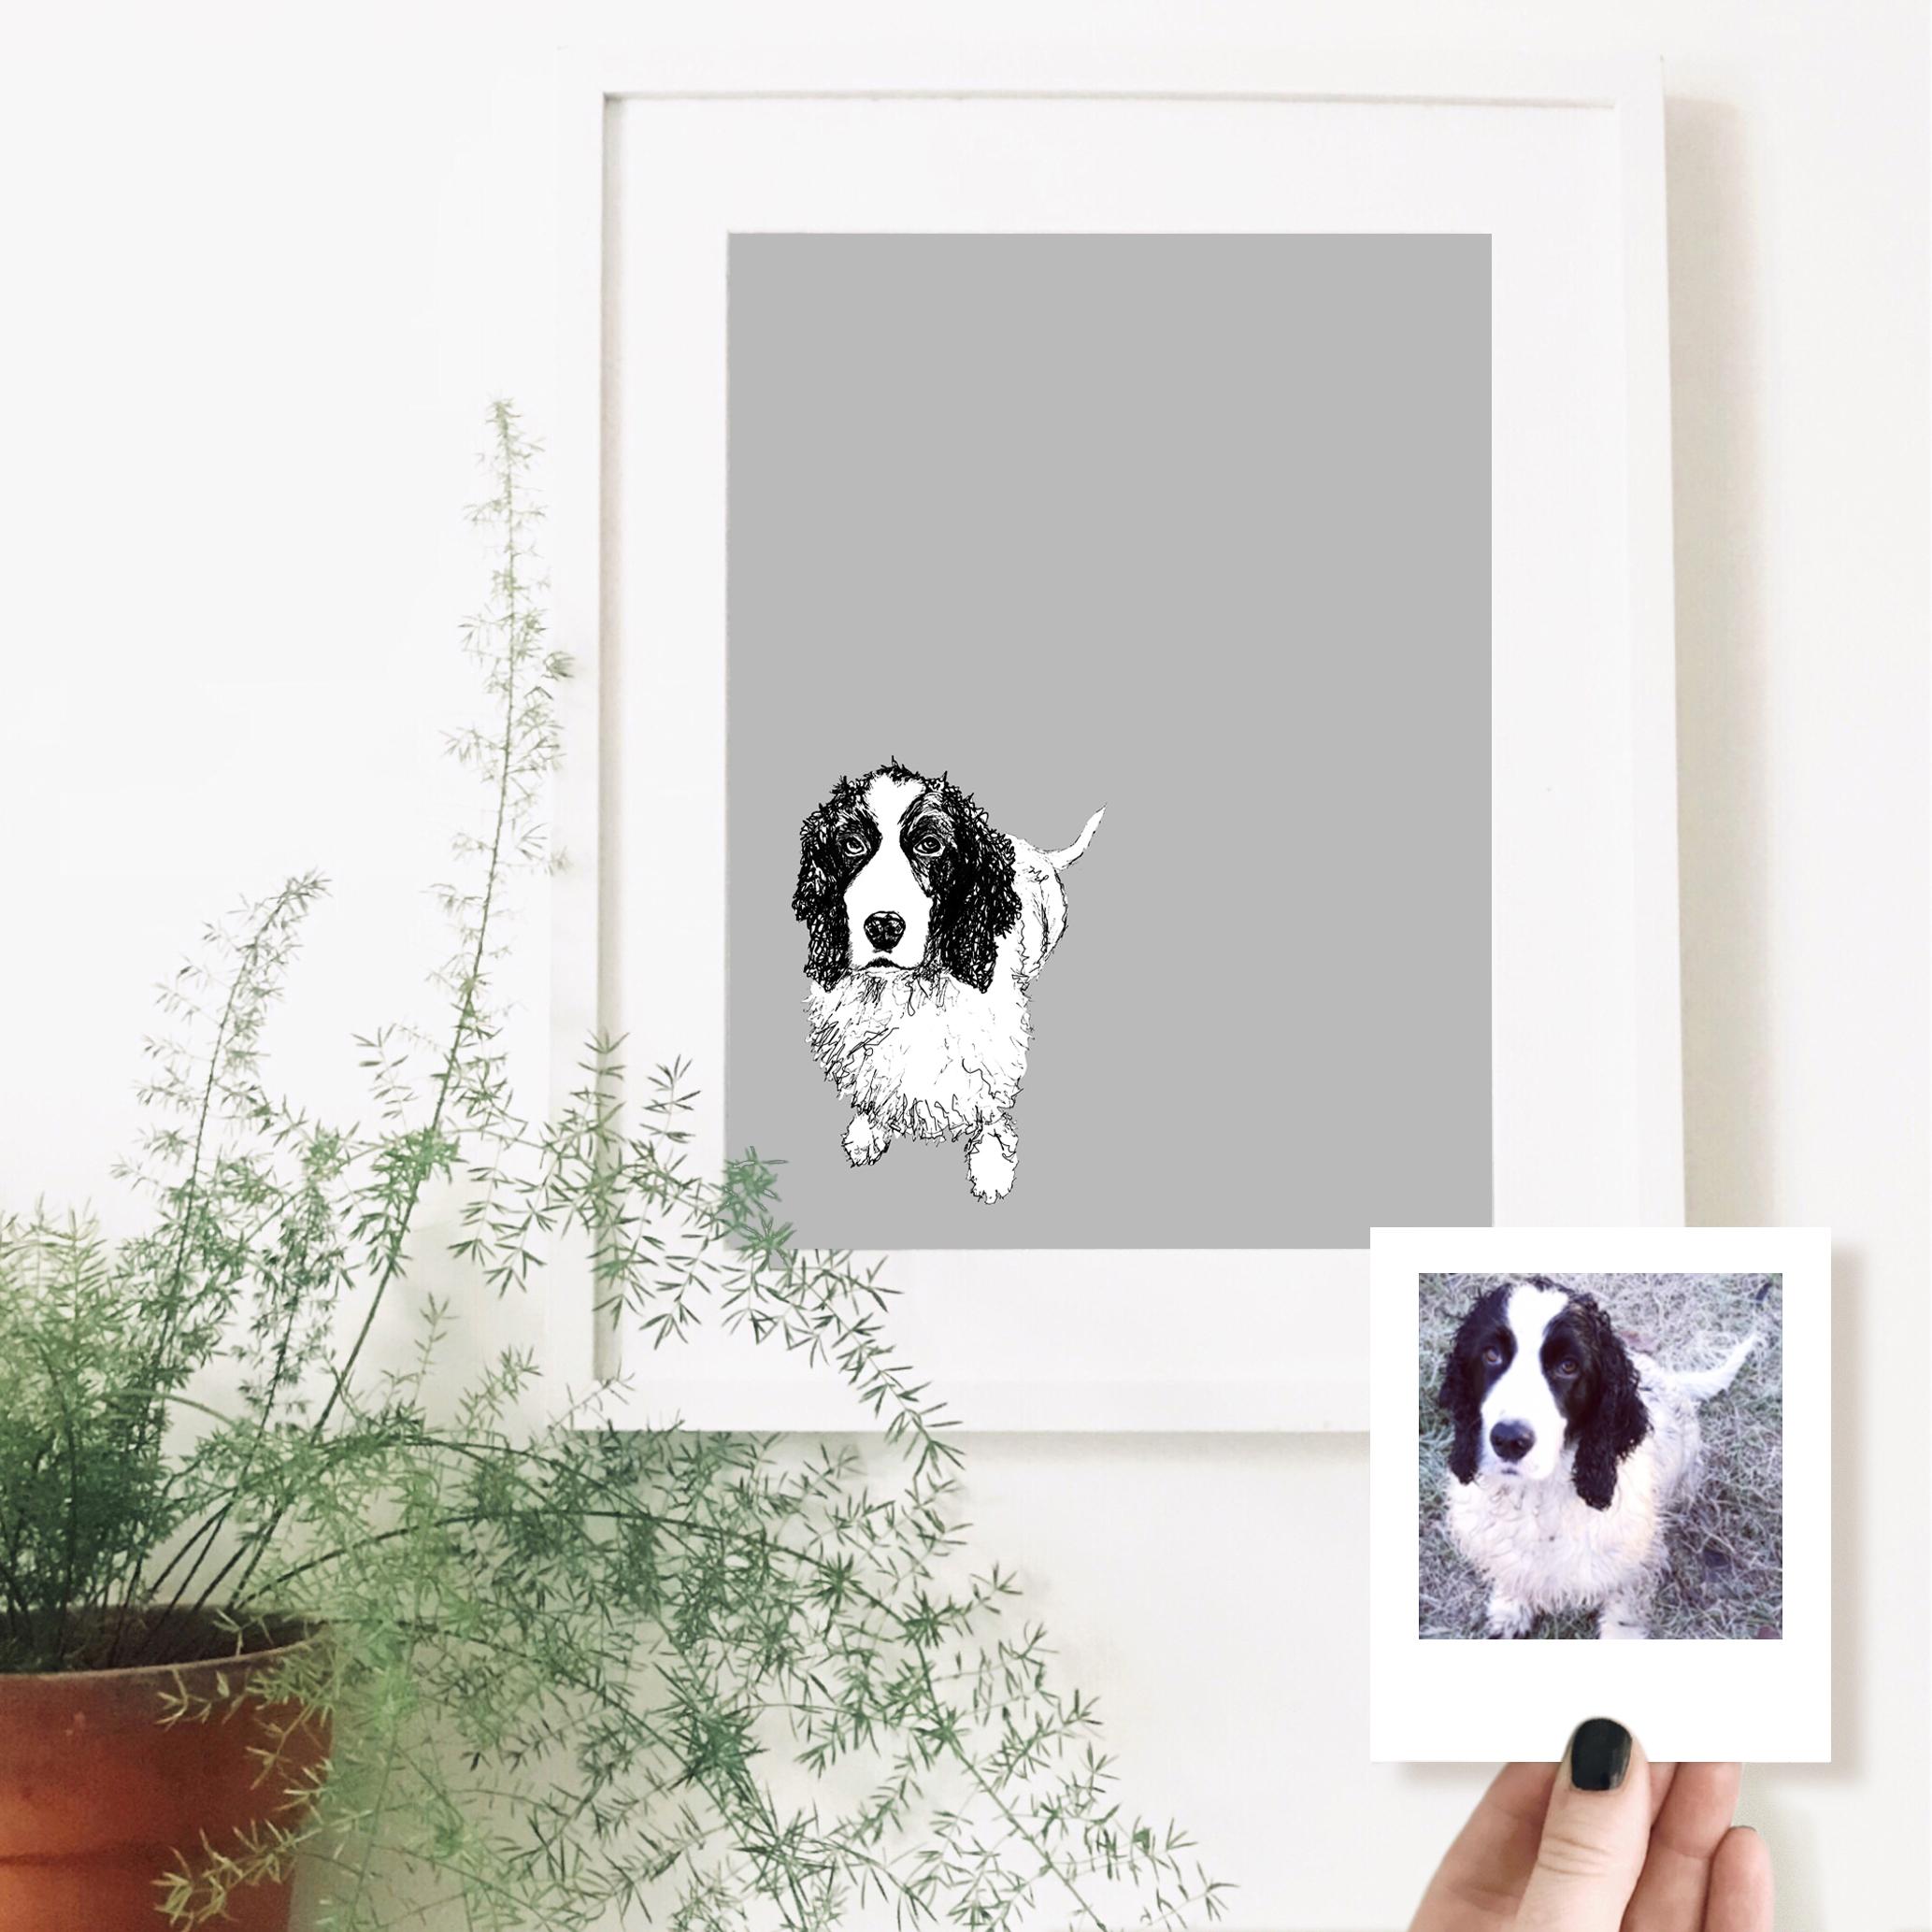 cocker-spaniel-dog-pet-portrait-drawing.jpg